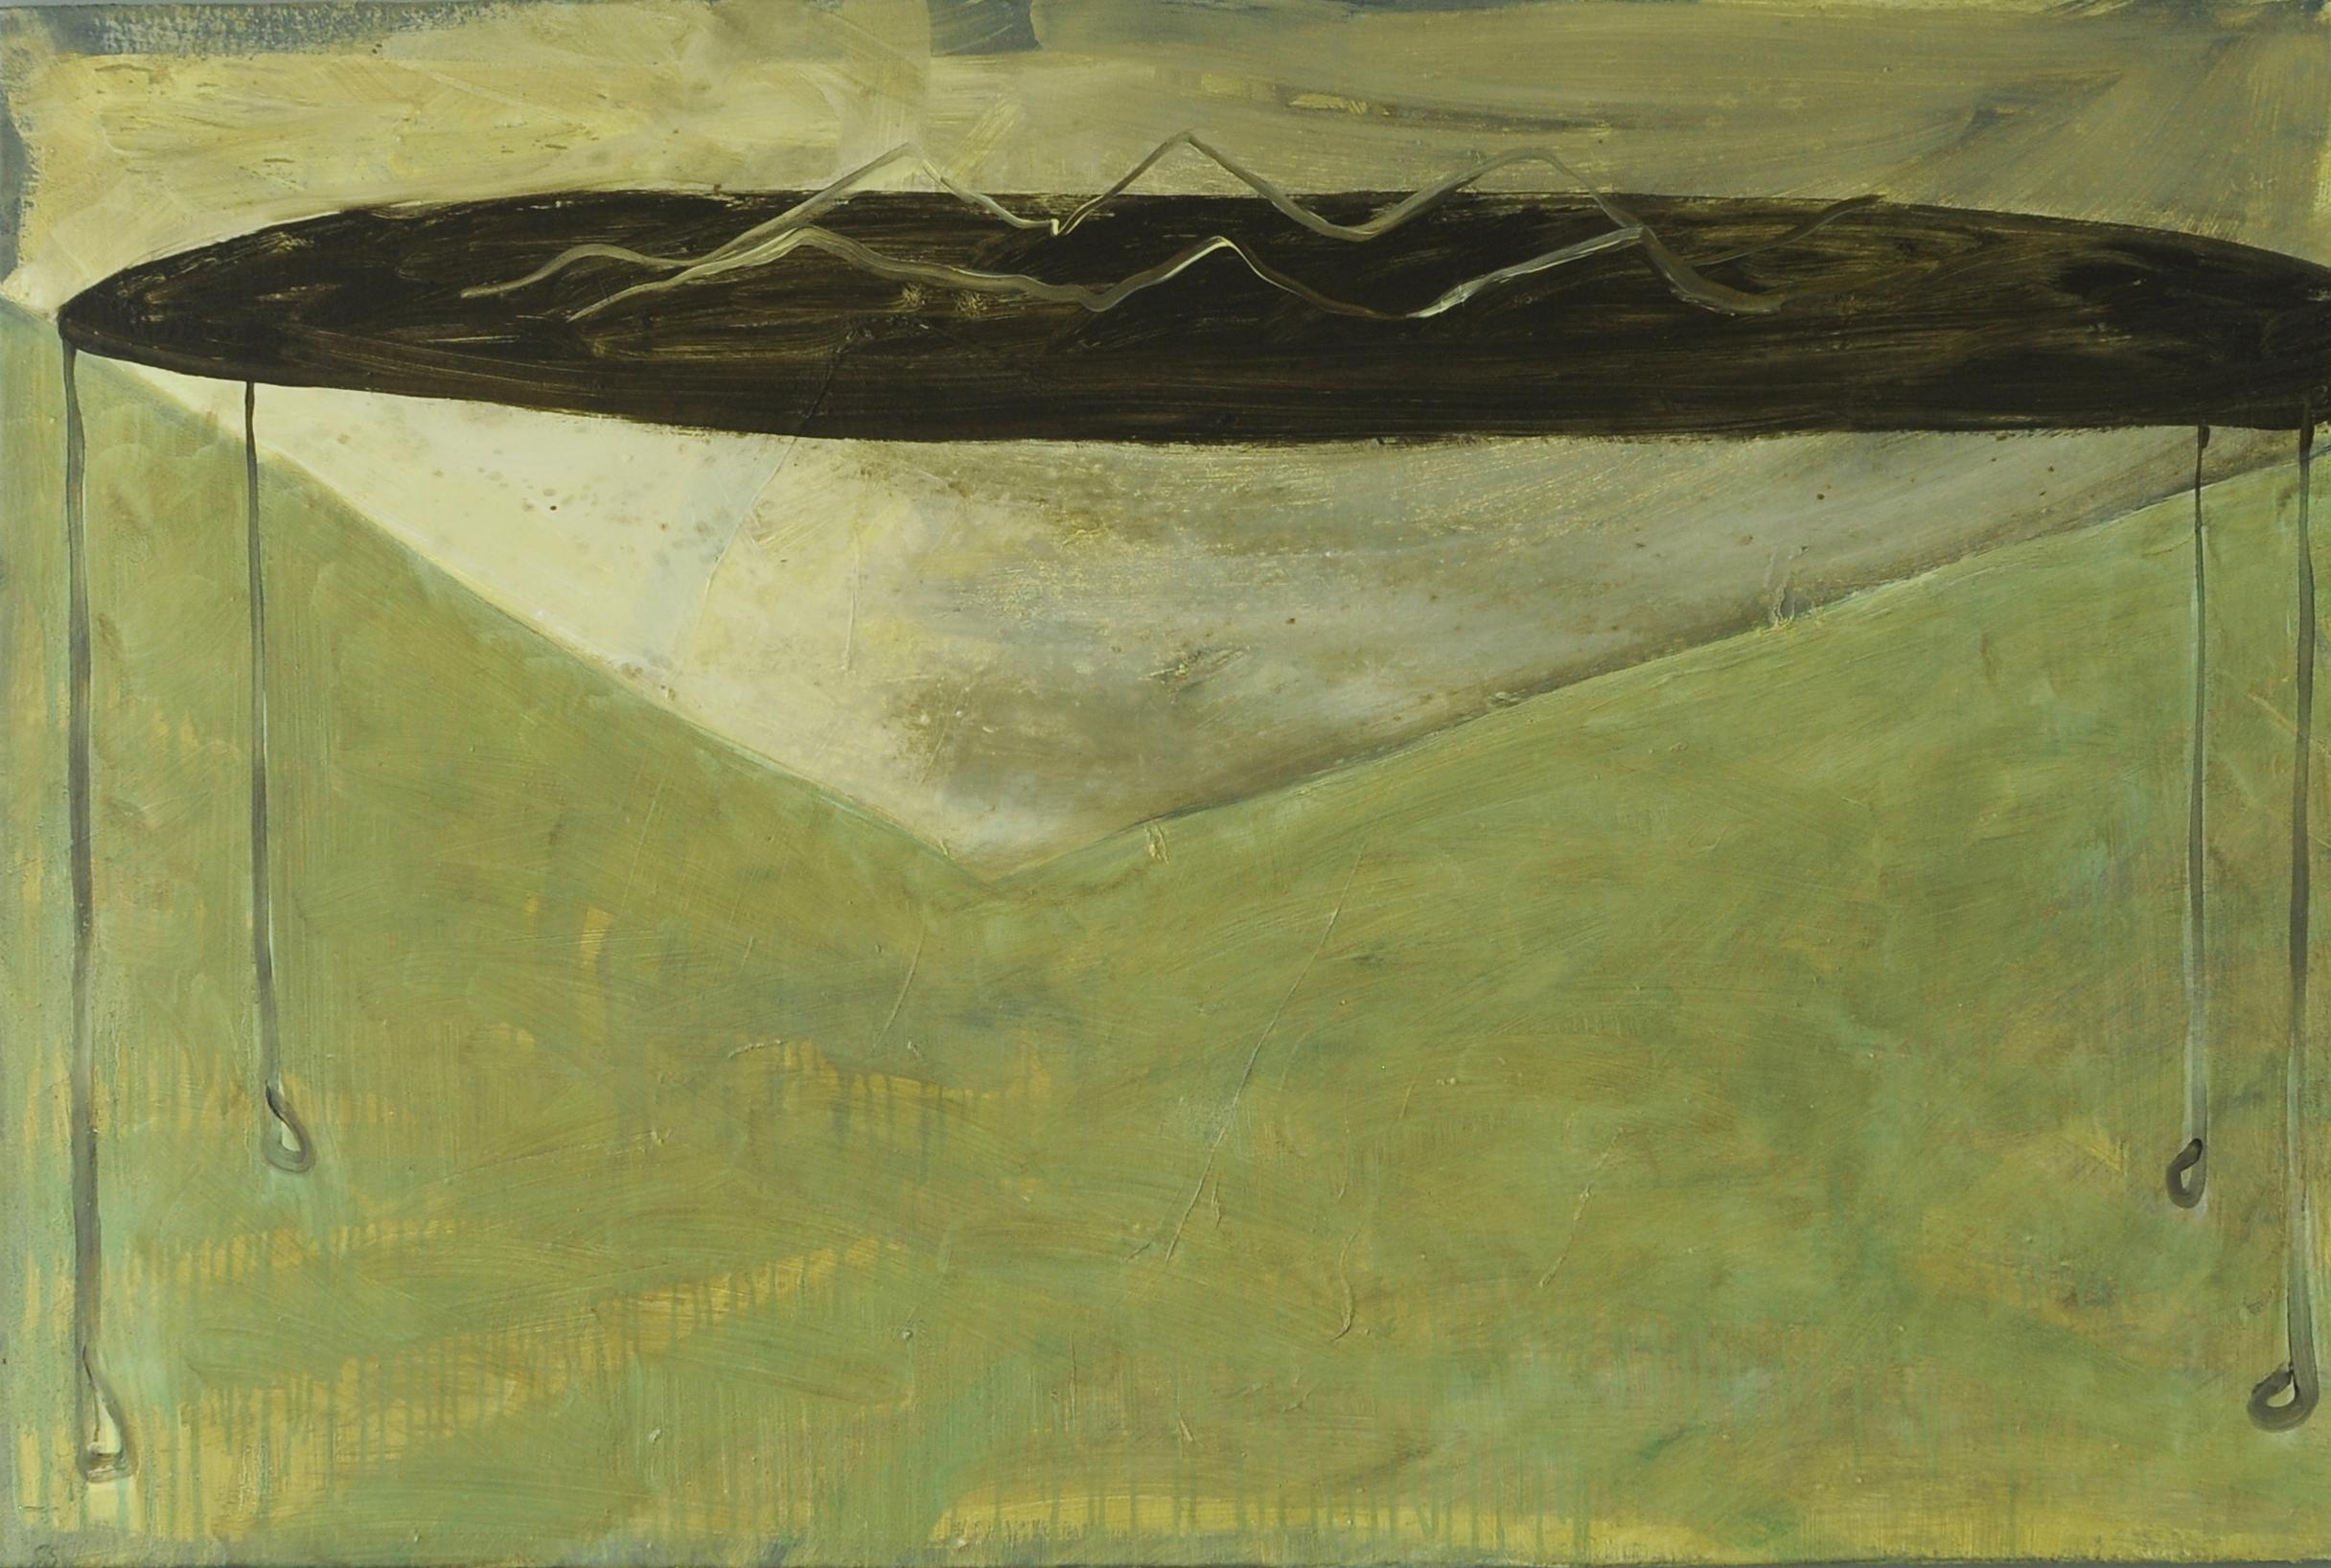 Wave, 2011, Oil on half oil ground, 80 x 120 cm